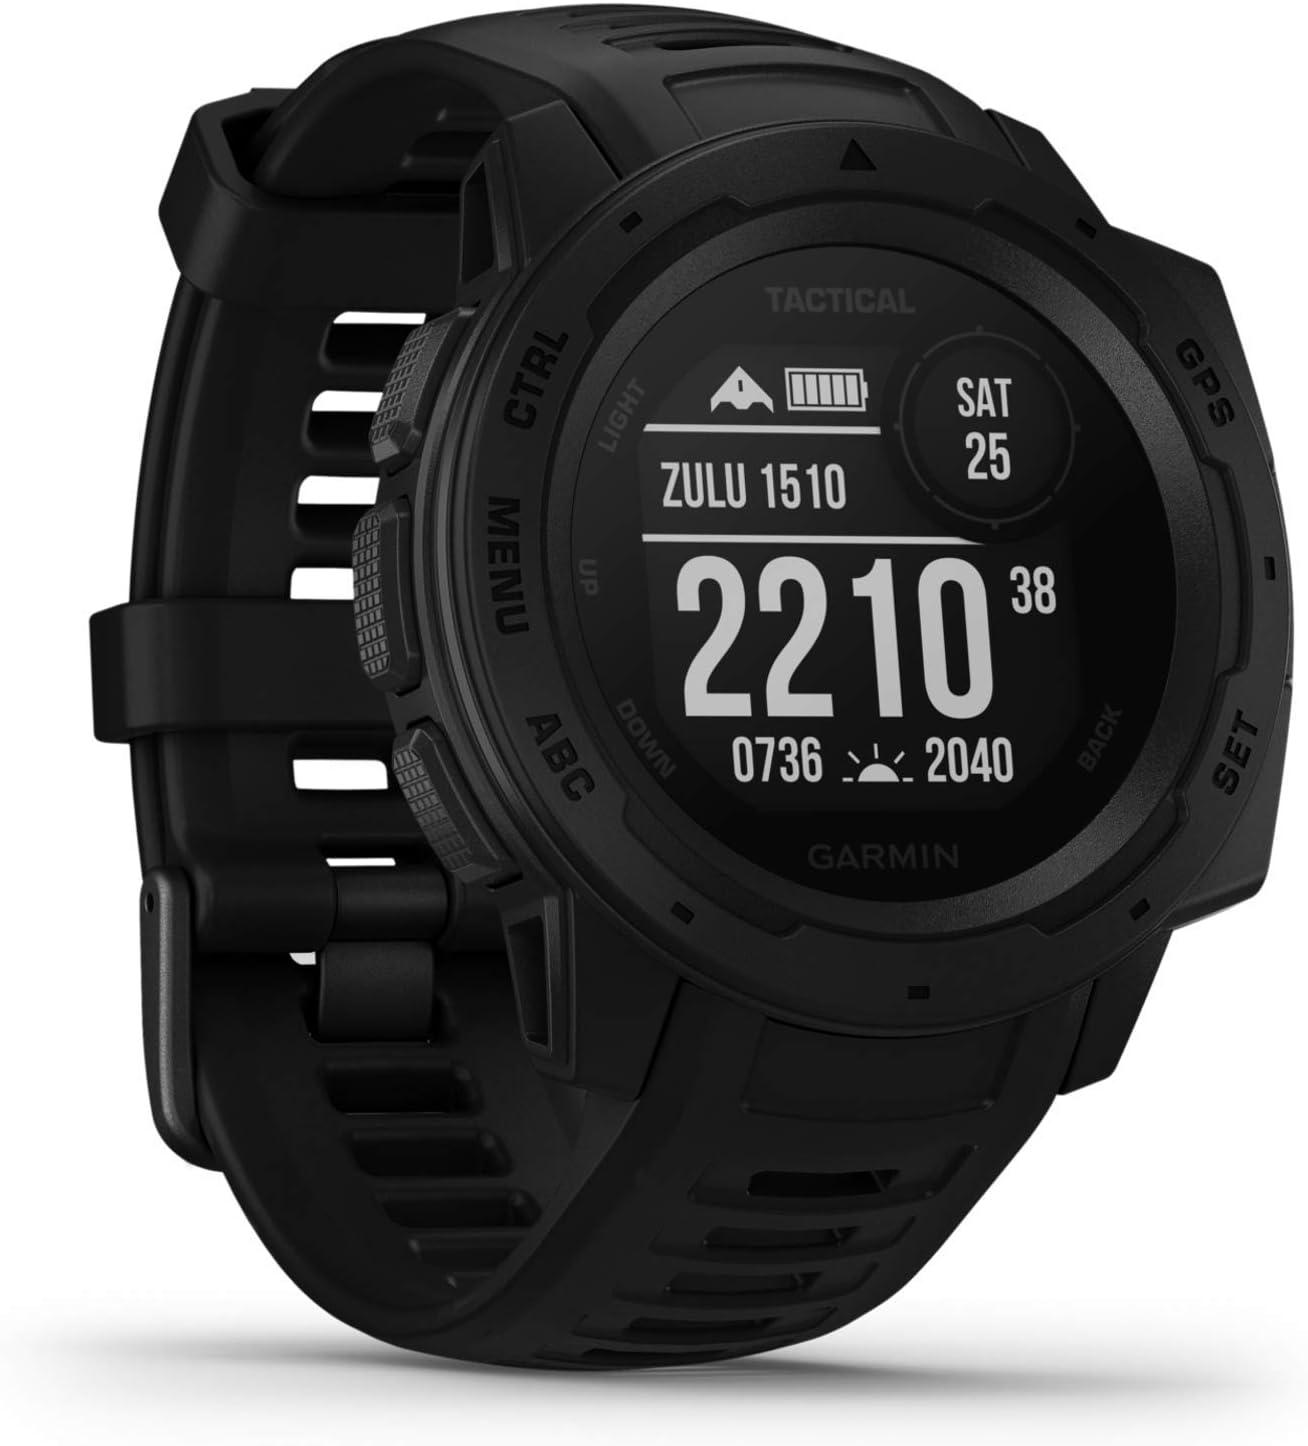 Garmin Instinct Tactical - robuste GPS-Smartwatch mit: Amazon.de: Elektronik - Garmin Uhren